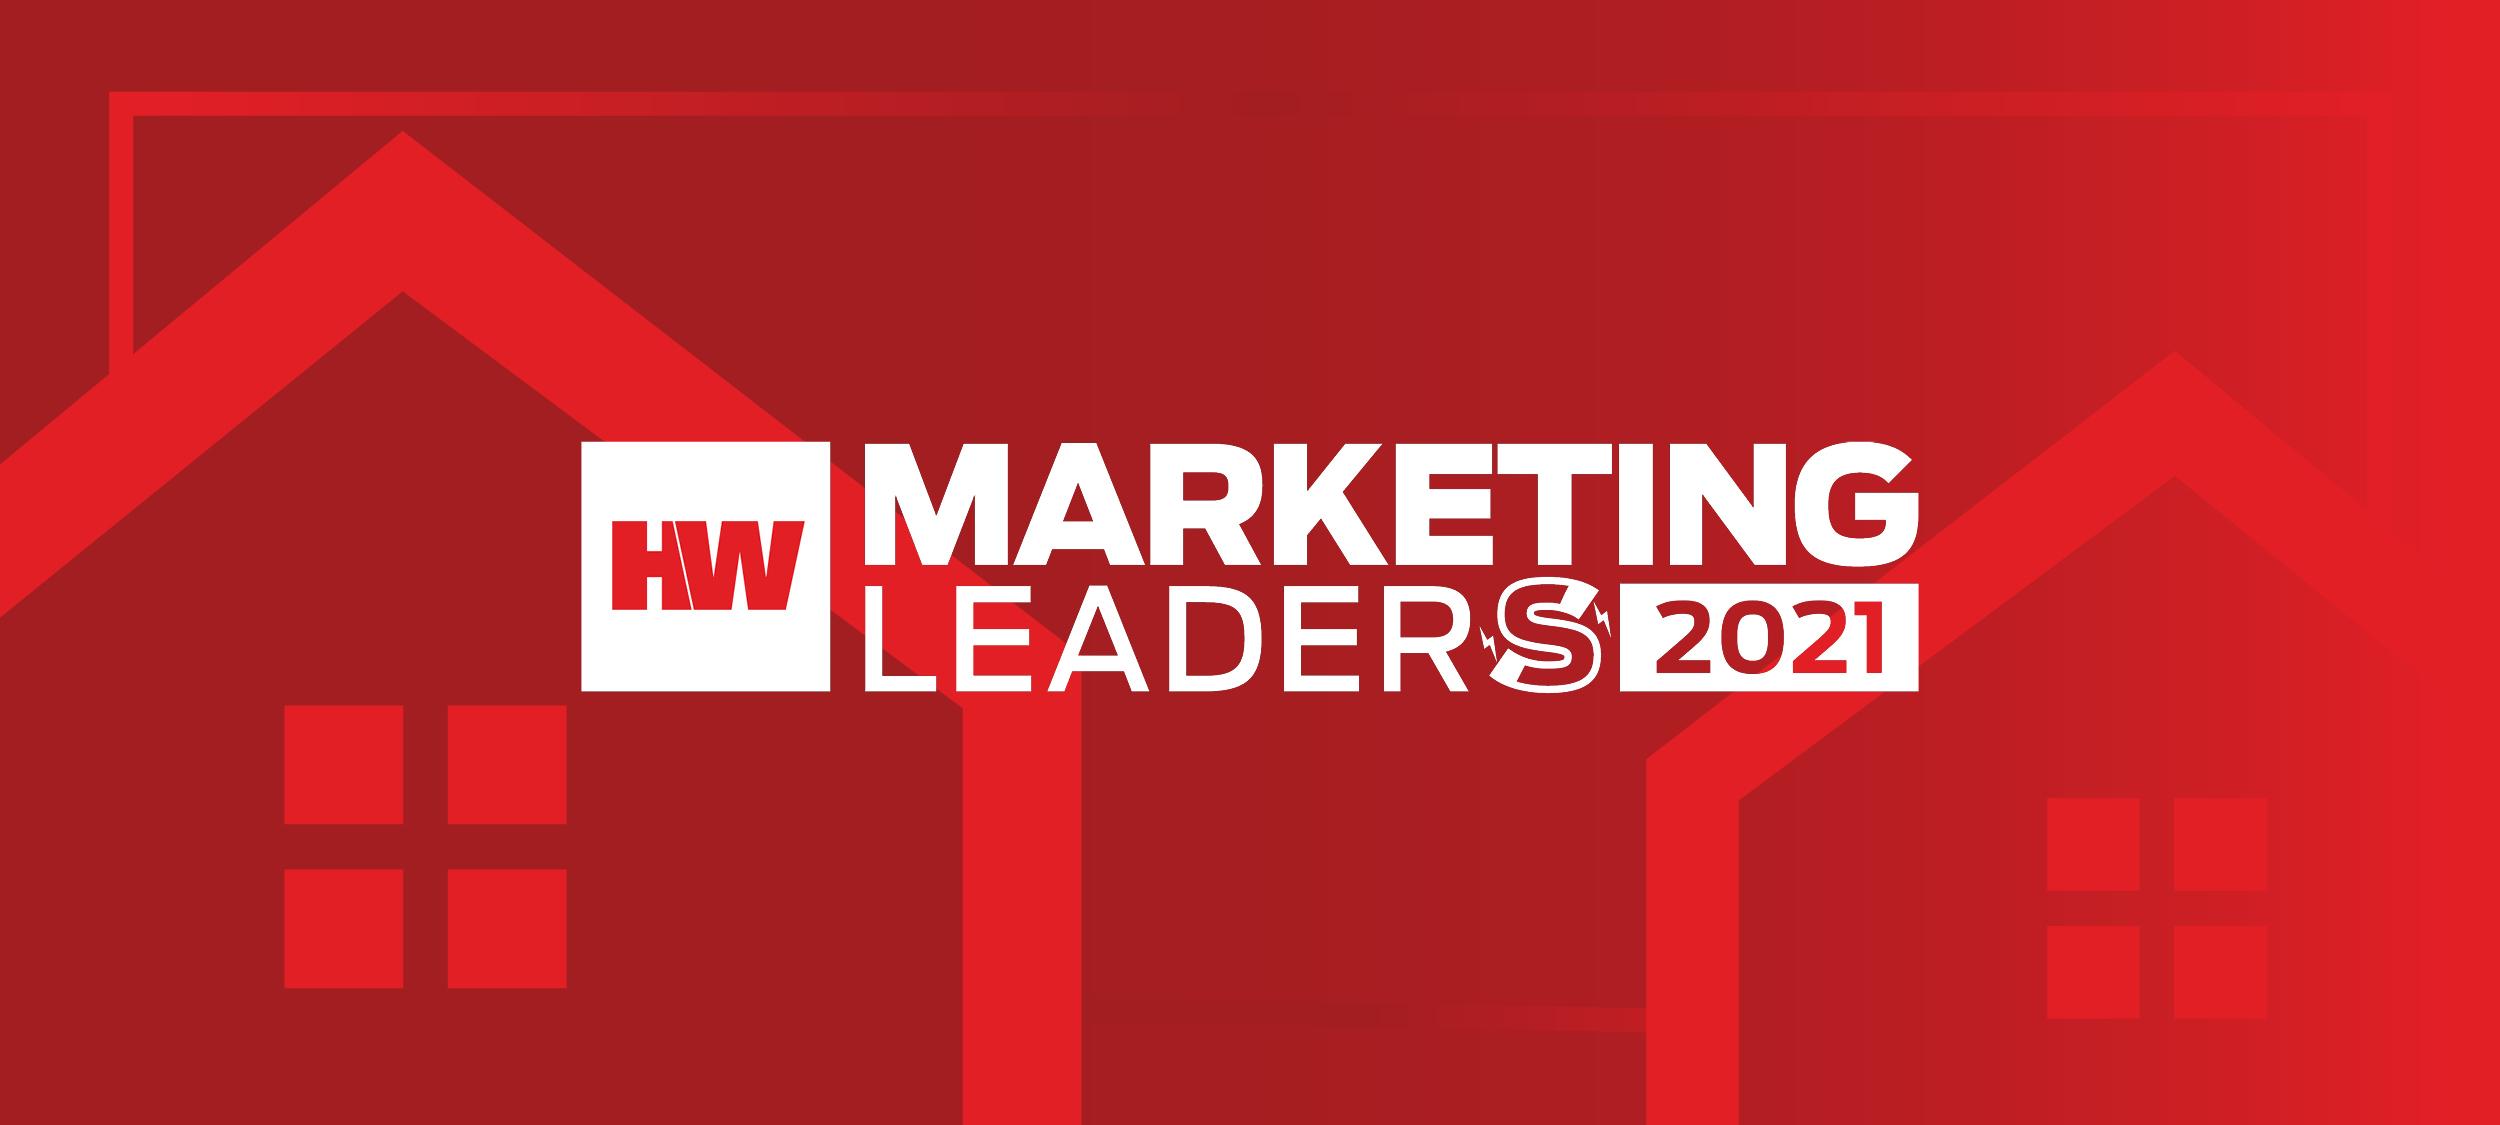 HousingWire Announces Ian Miller as 2021 Marketing Leader